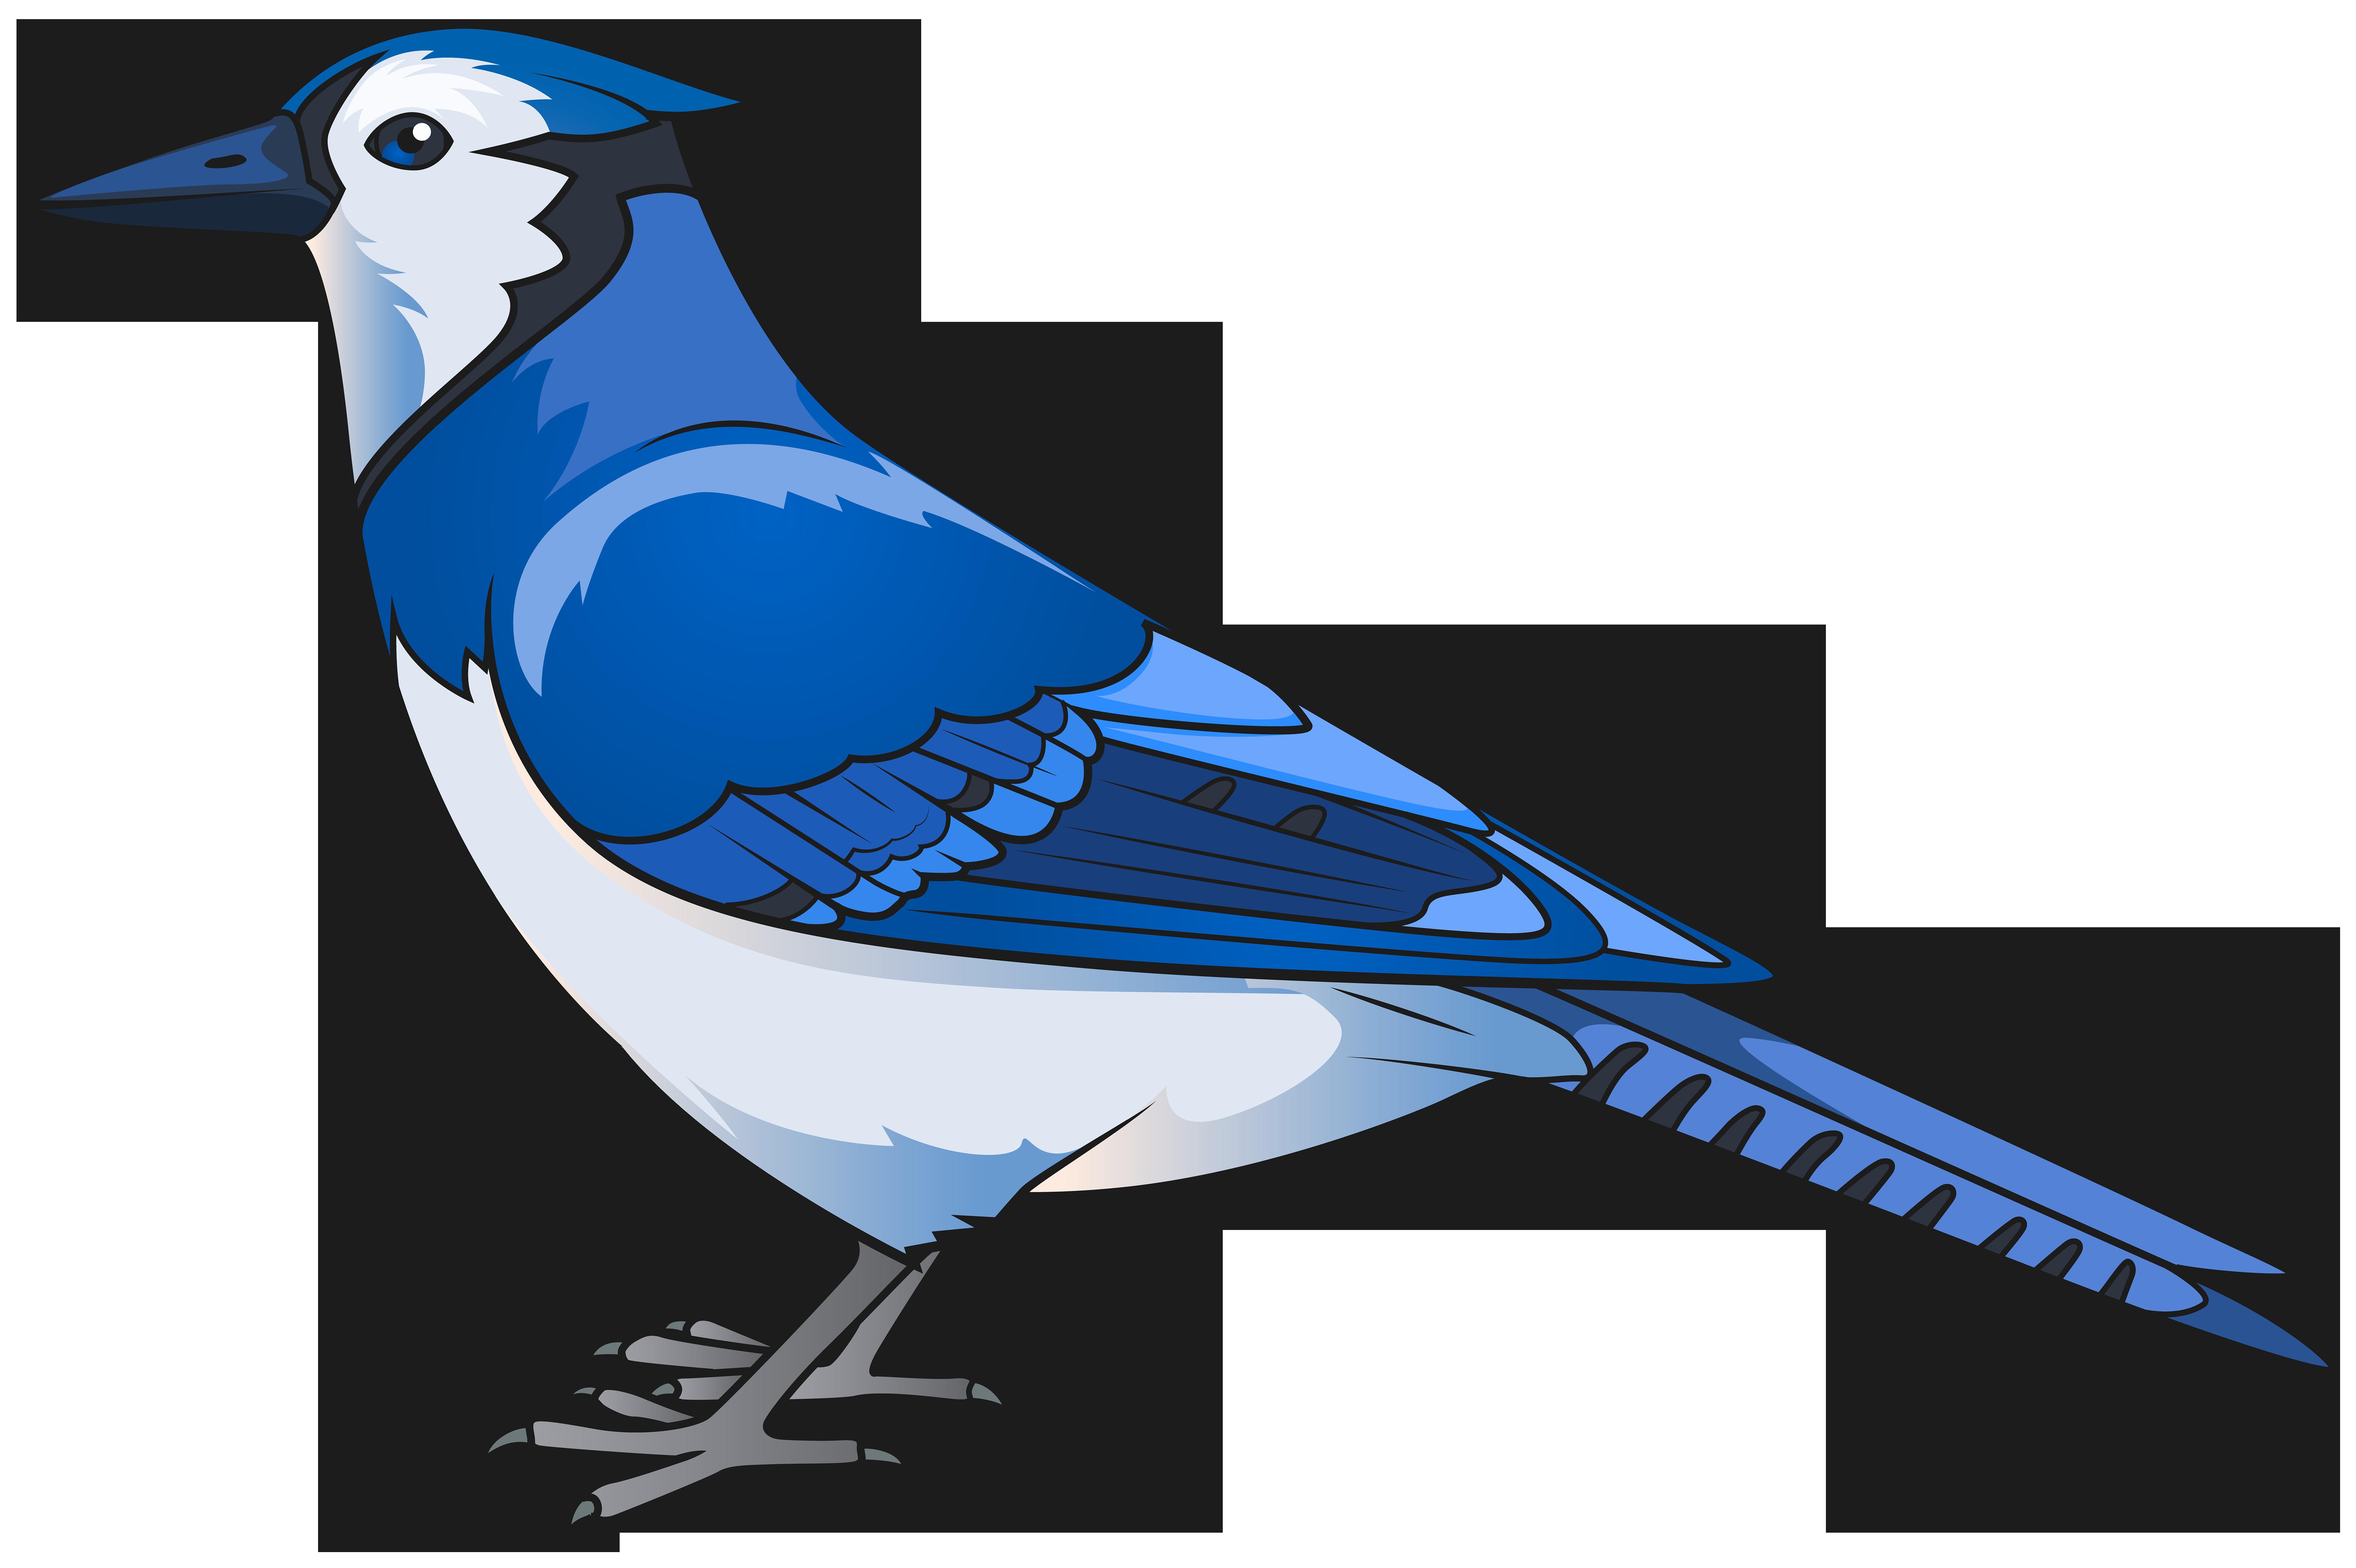 8000x5325 Blue Bird Transparent Png Clip Art Imageu200b Gallery Yopriceville